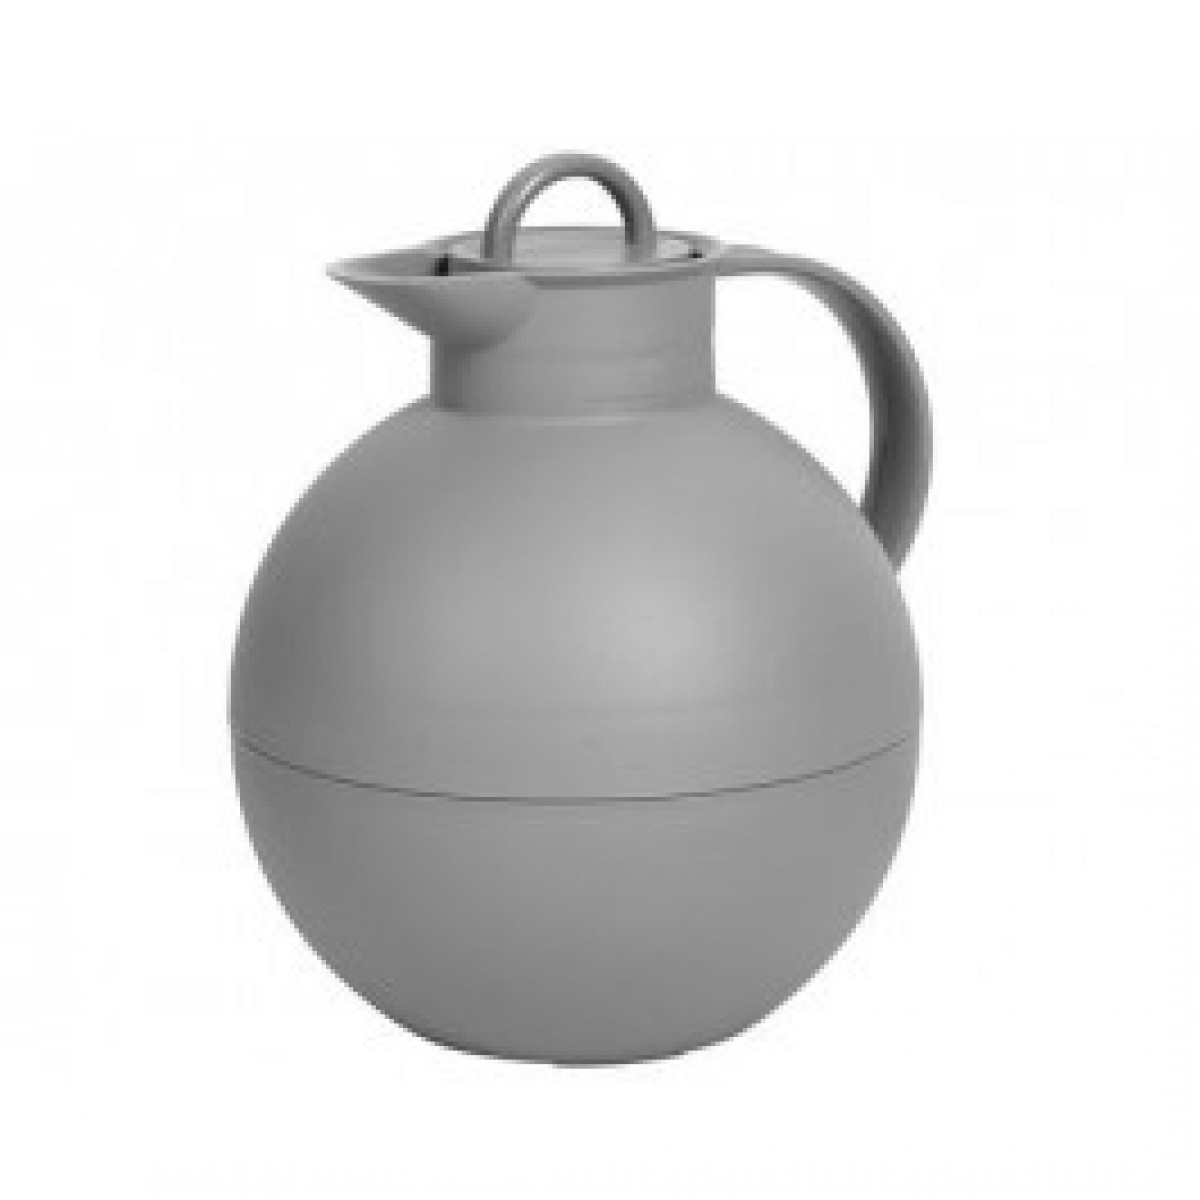 ALFI Kugle termokande grafit grå frosted 1 ltr.